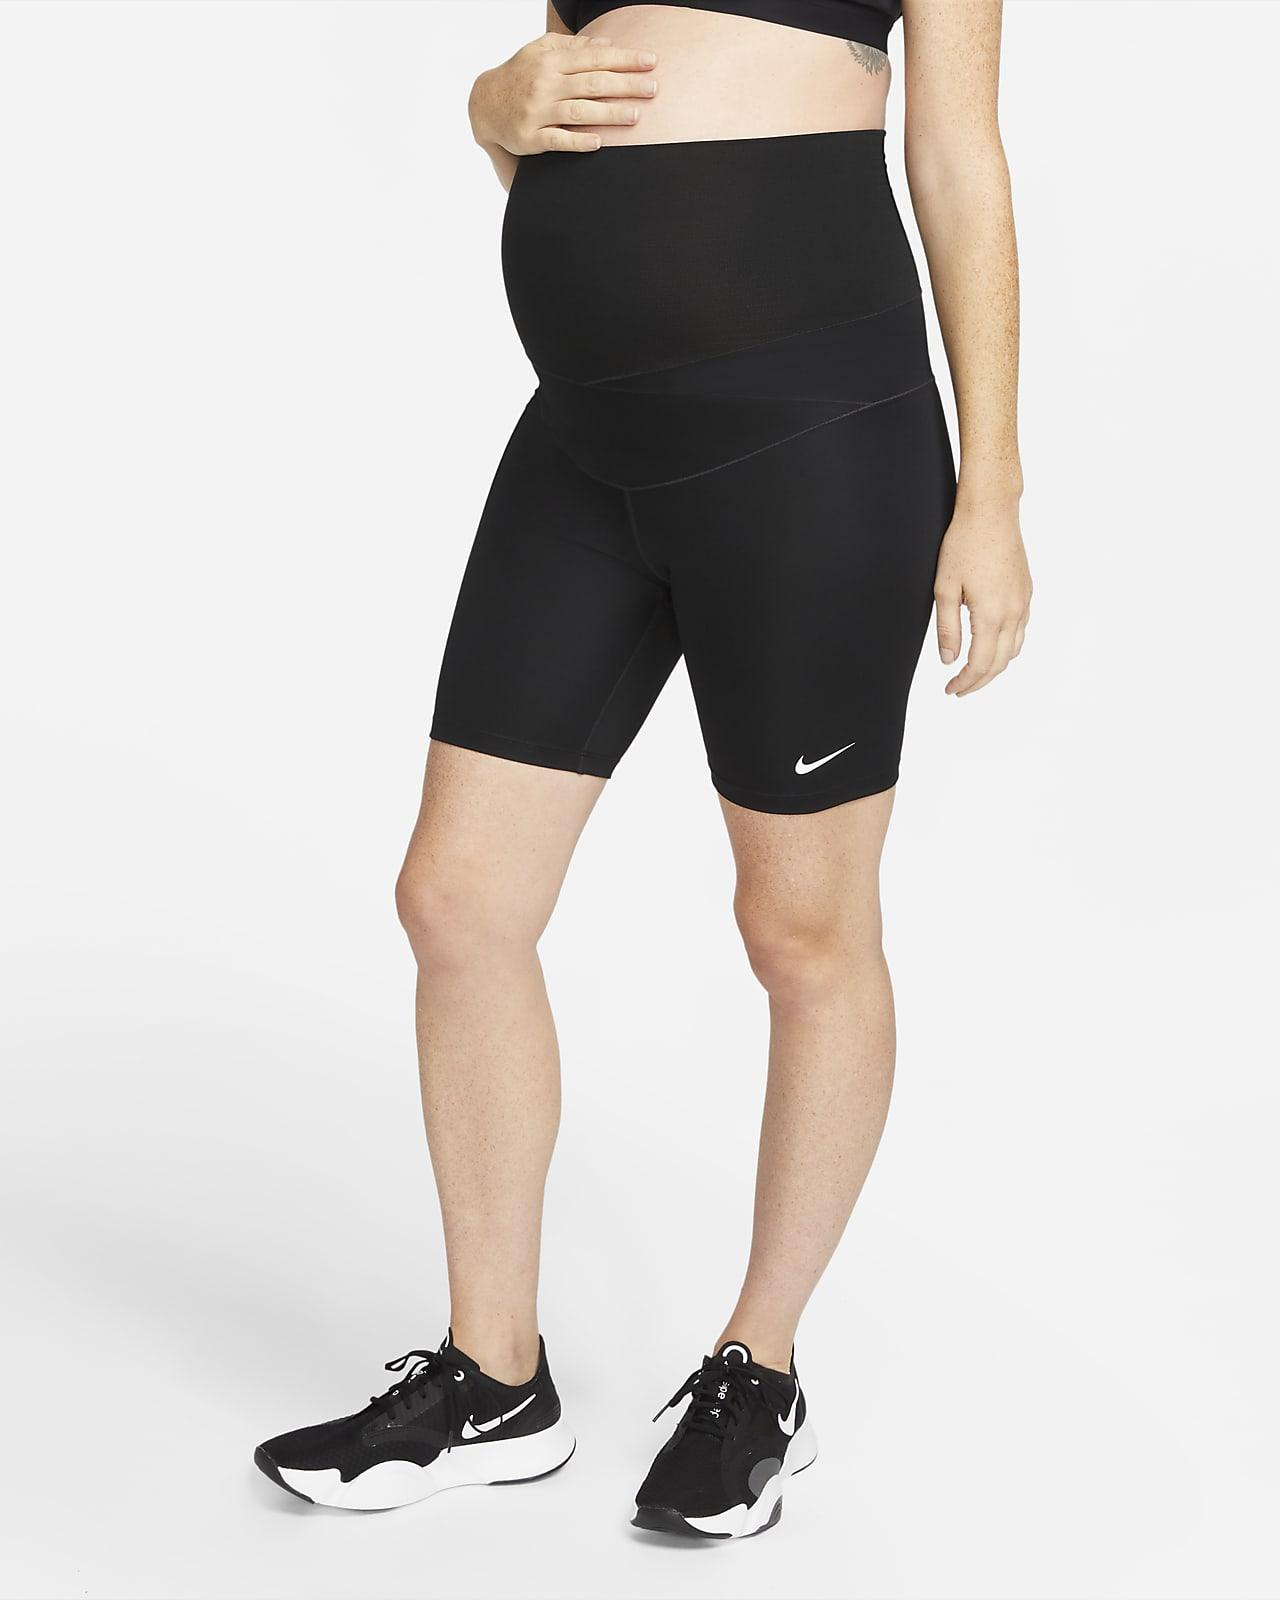 Nike One (M) Dri-FIT gravidshorts til dame (18 cm)